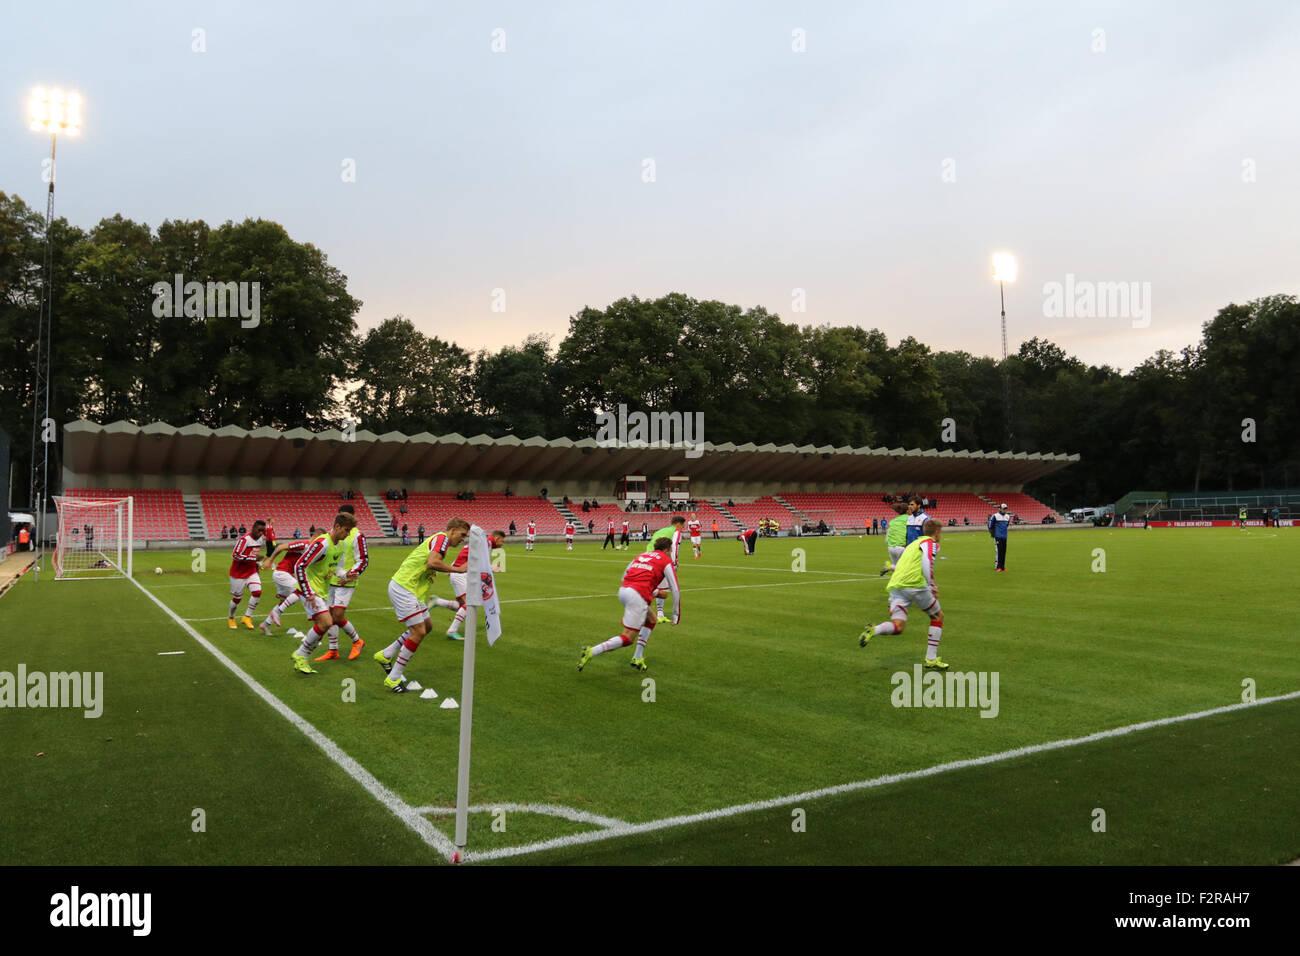 Franz Kremer Stadion. 22. September 2015, Franz-Kremer-Allee, Köln. FC Köln V Rot-Weiß Oberhausen. Stockbild